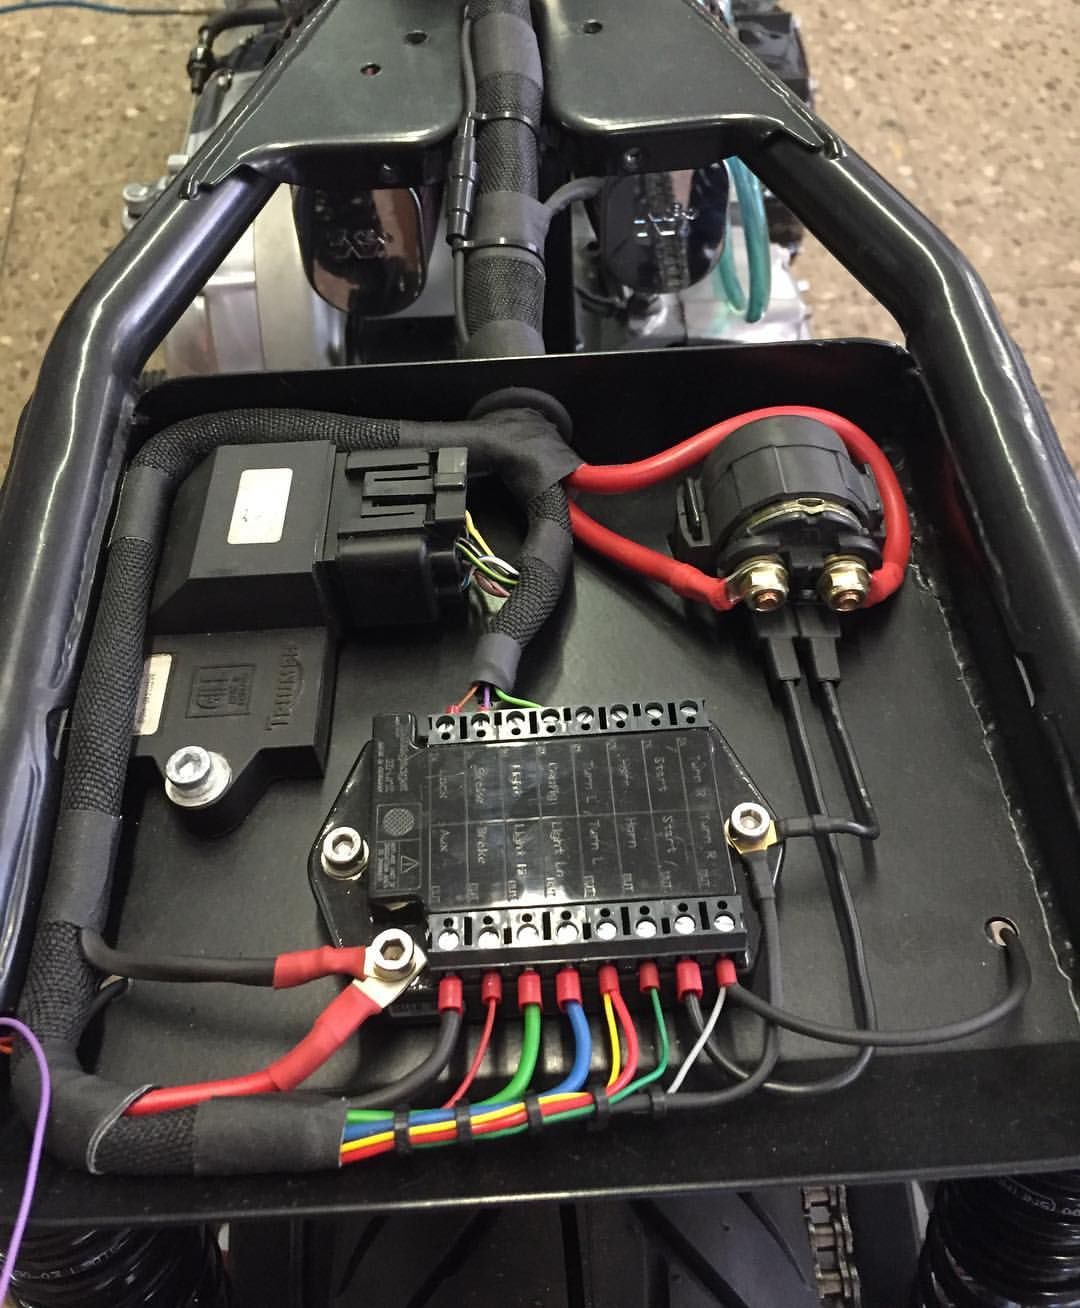 gef llt 39 mal 3 kommentare caferacersbcn auf instagram rh pinterest com custom motorcycle wiring harness custom motorcycle wiring harness kits